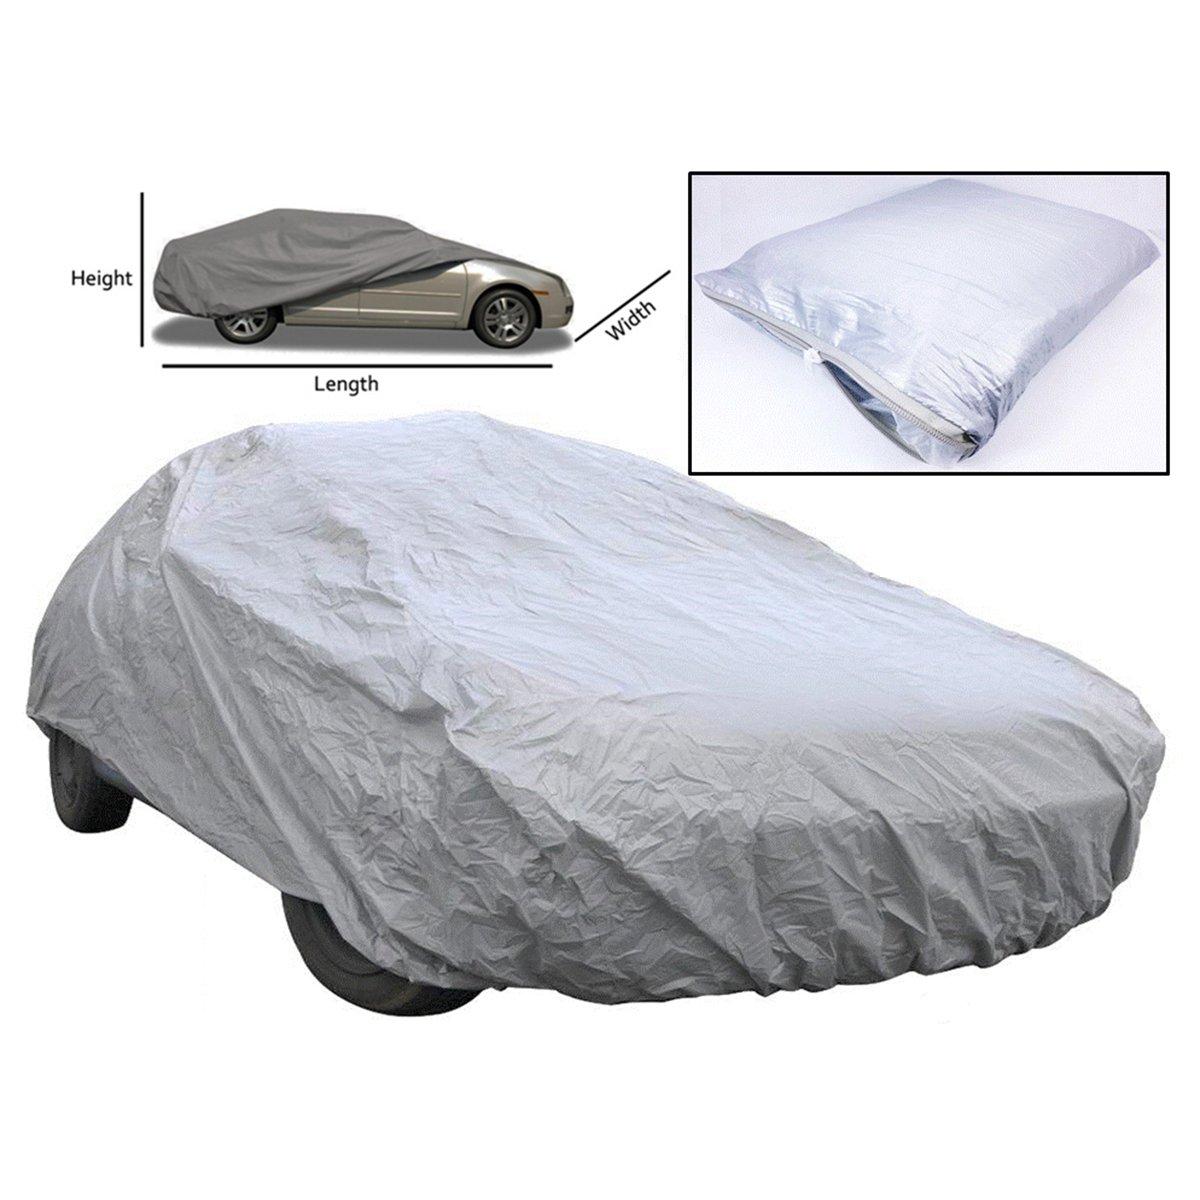 /Talla M WINOMO fundas para Auto Coche llena protectora impermeable UV protecci/ón exterior interior transpirable/